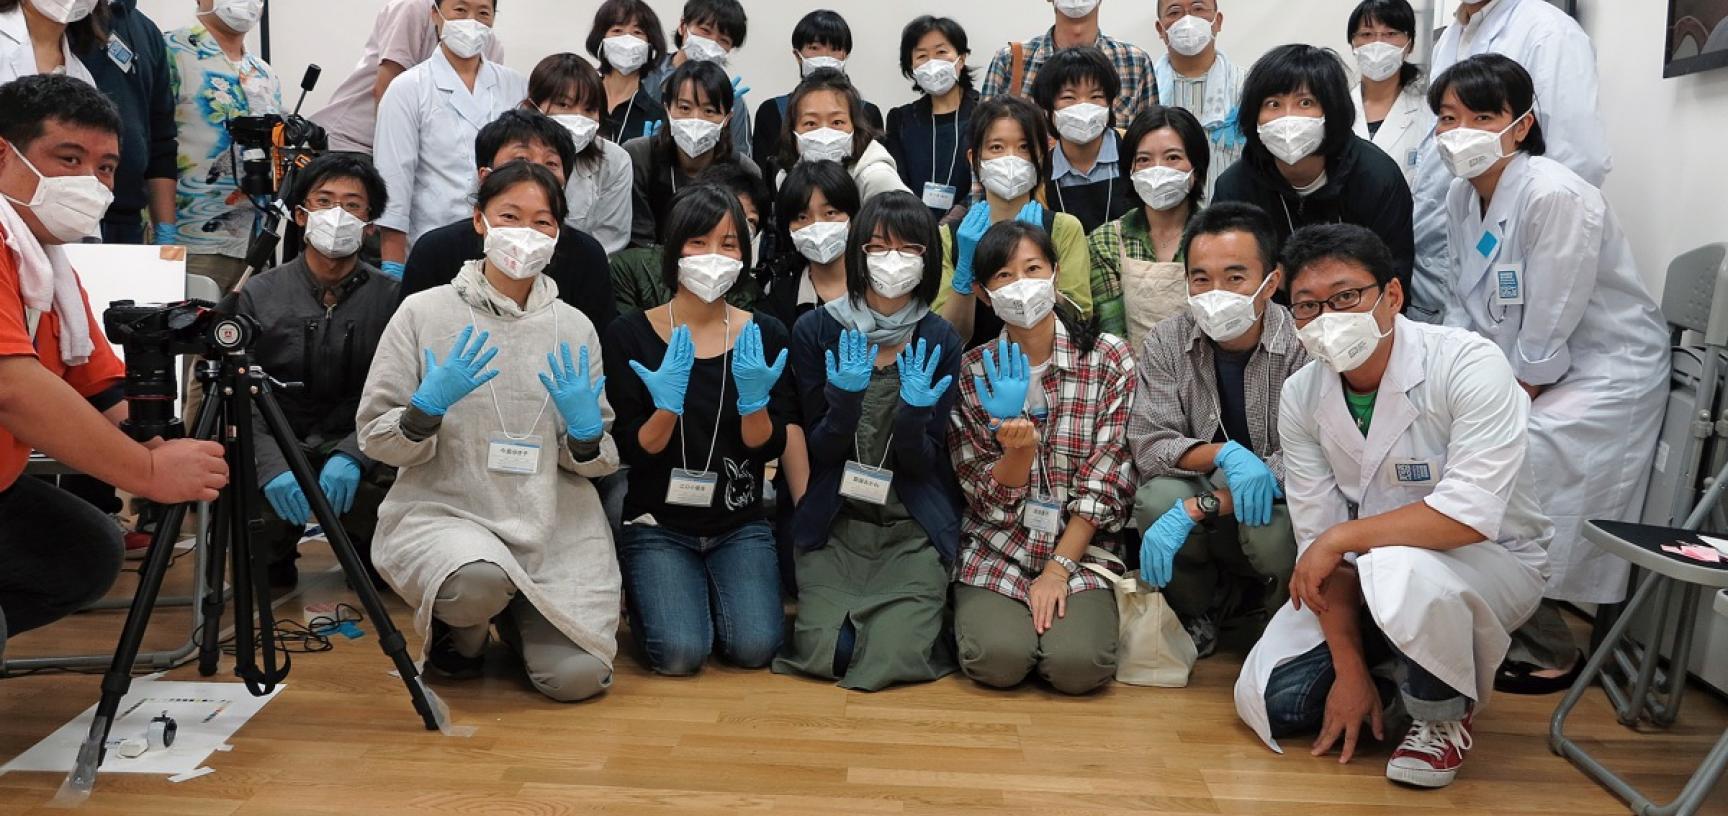 Members of the Rikuzentakata Disaster Document Digitalization Project. (Copyright RD3 Project/Rikuzentakata City Museum)